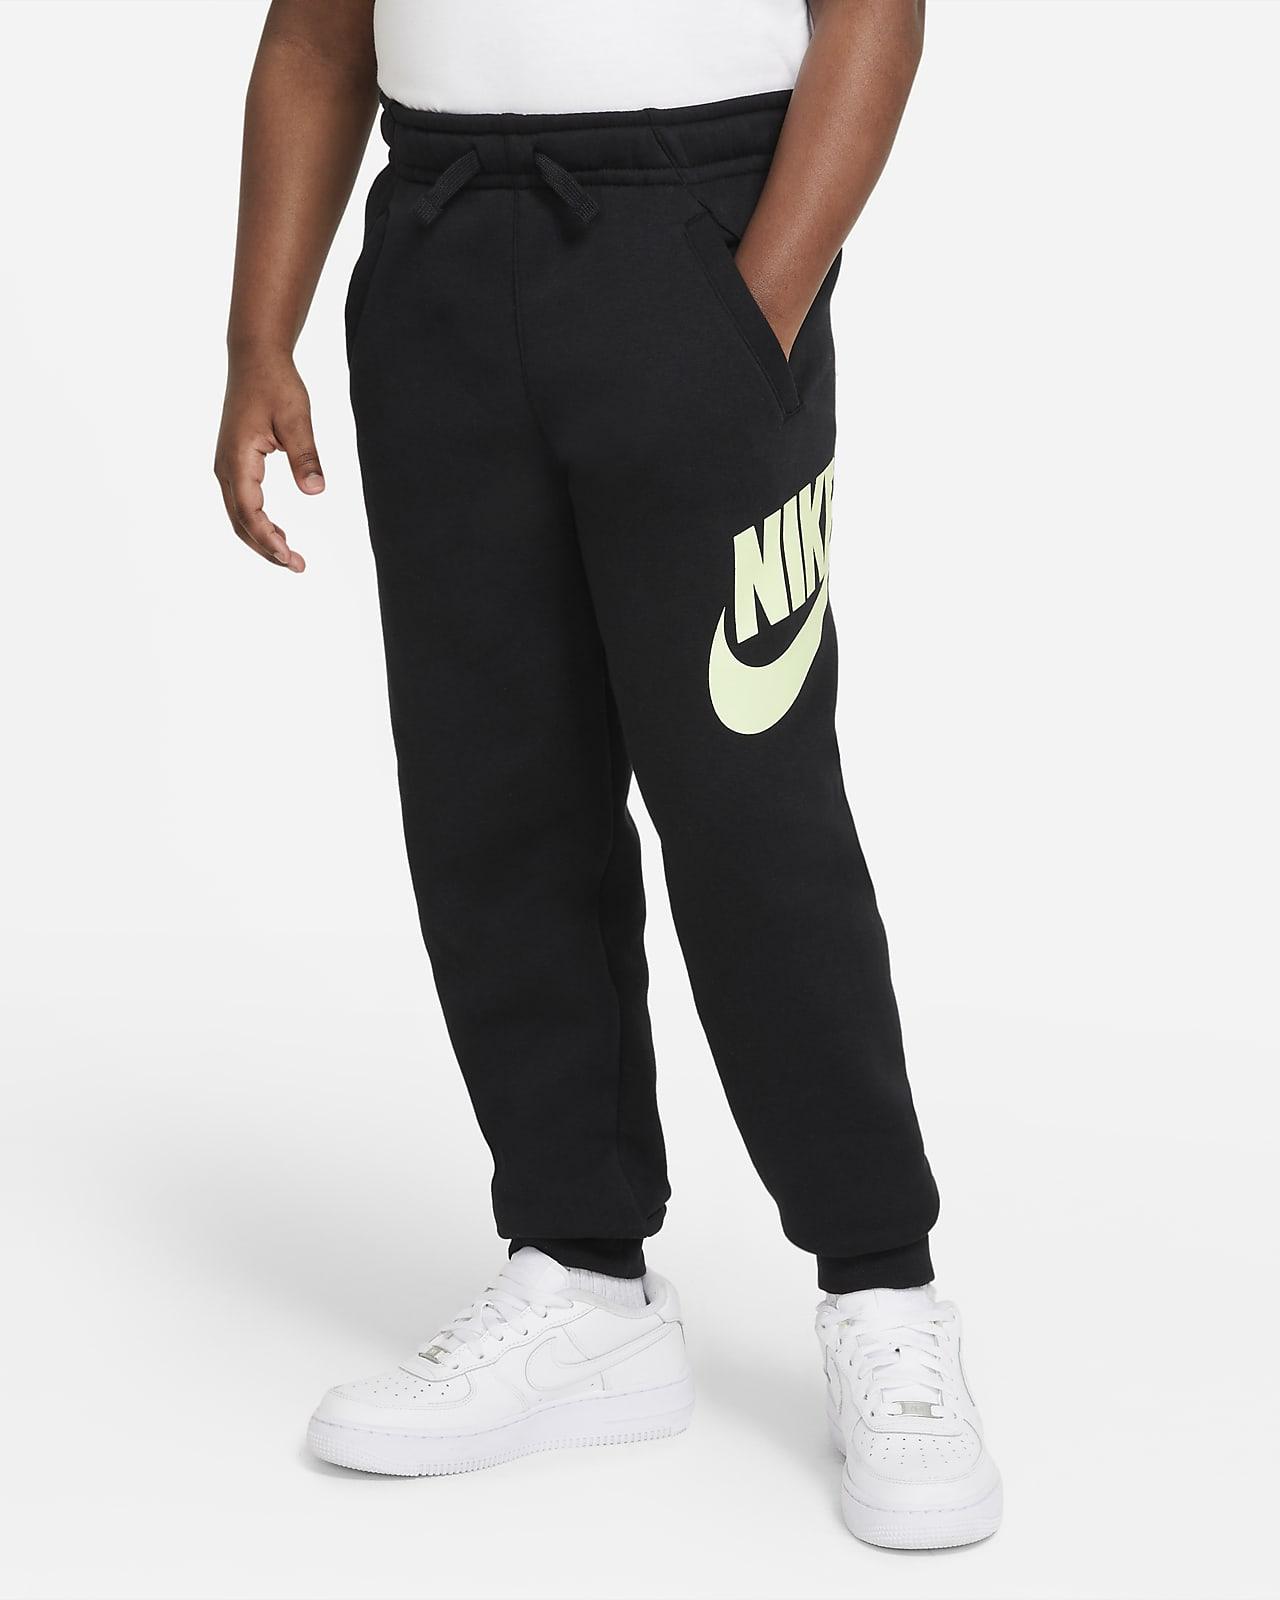 Pantalon Nike Sportswear Club Fleece pour Garçon plus âgé (grande taille)